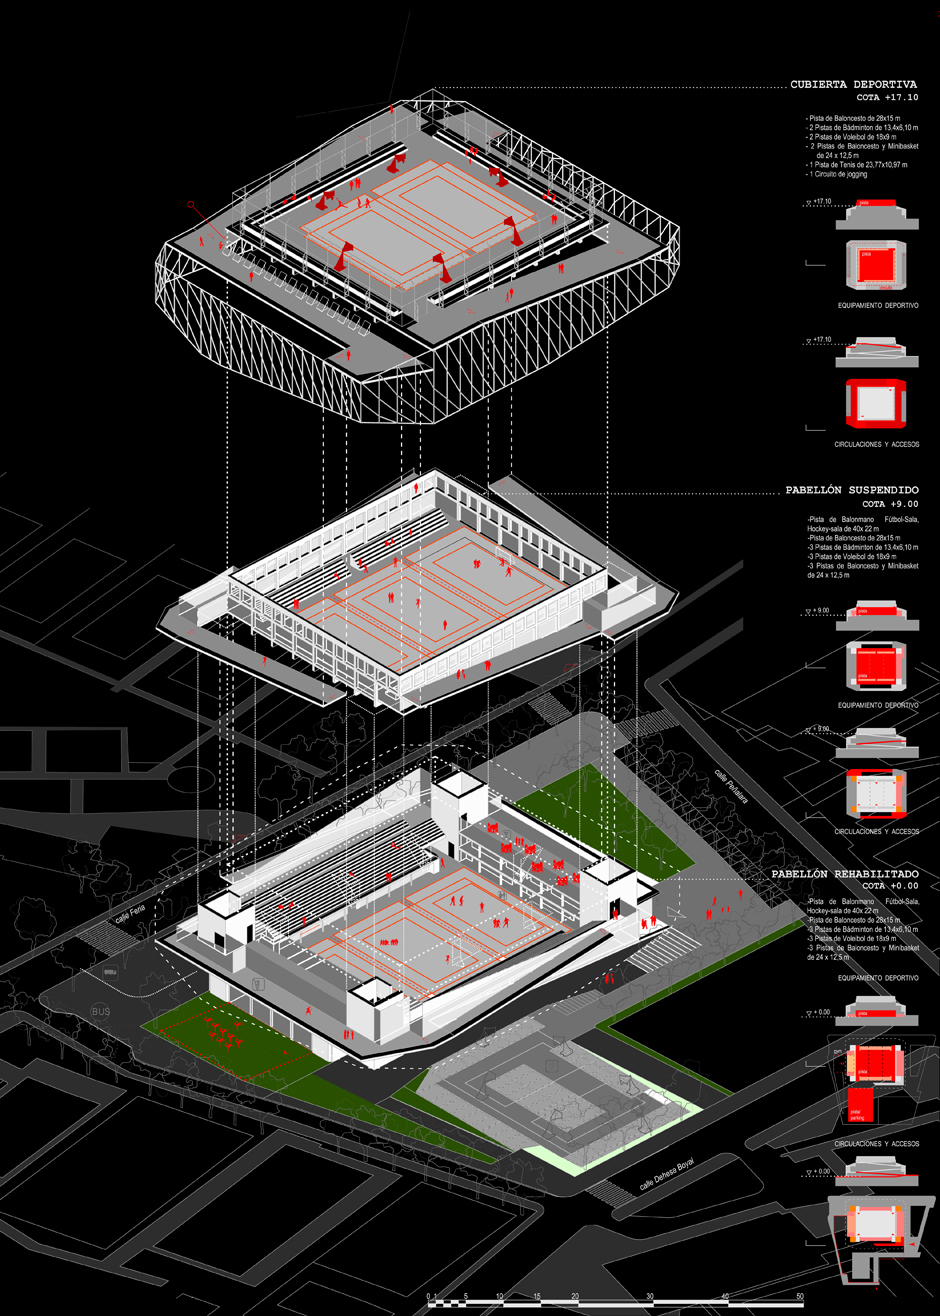 C:UsersArkineticaDropbox17-15 Pabellón Deportivo VillalbaCo